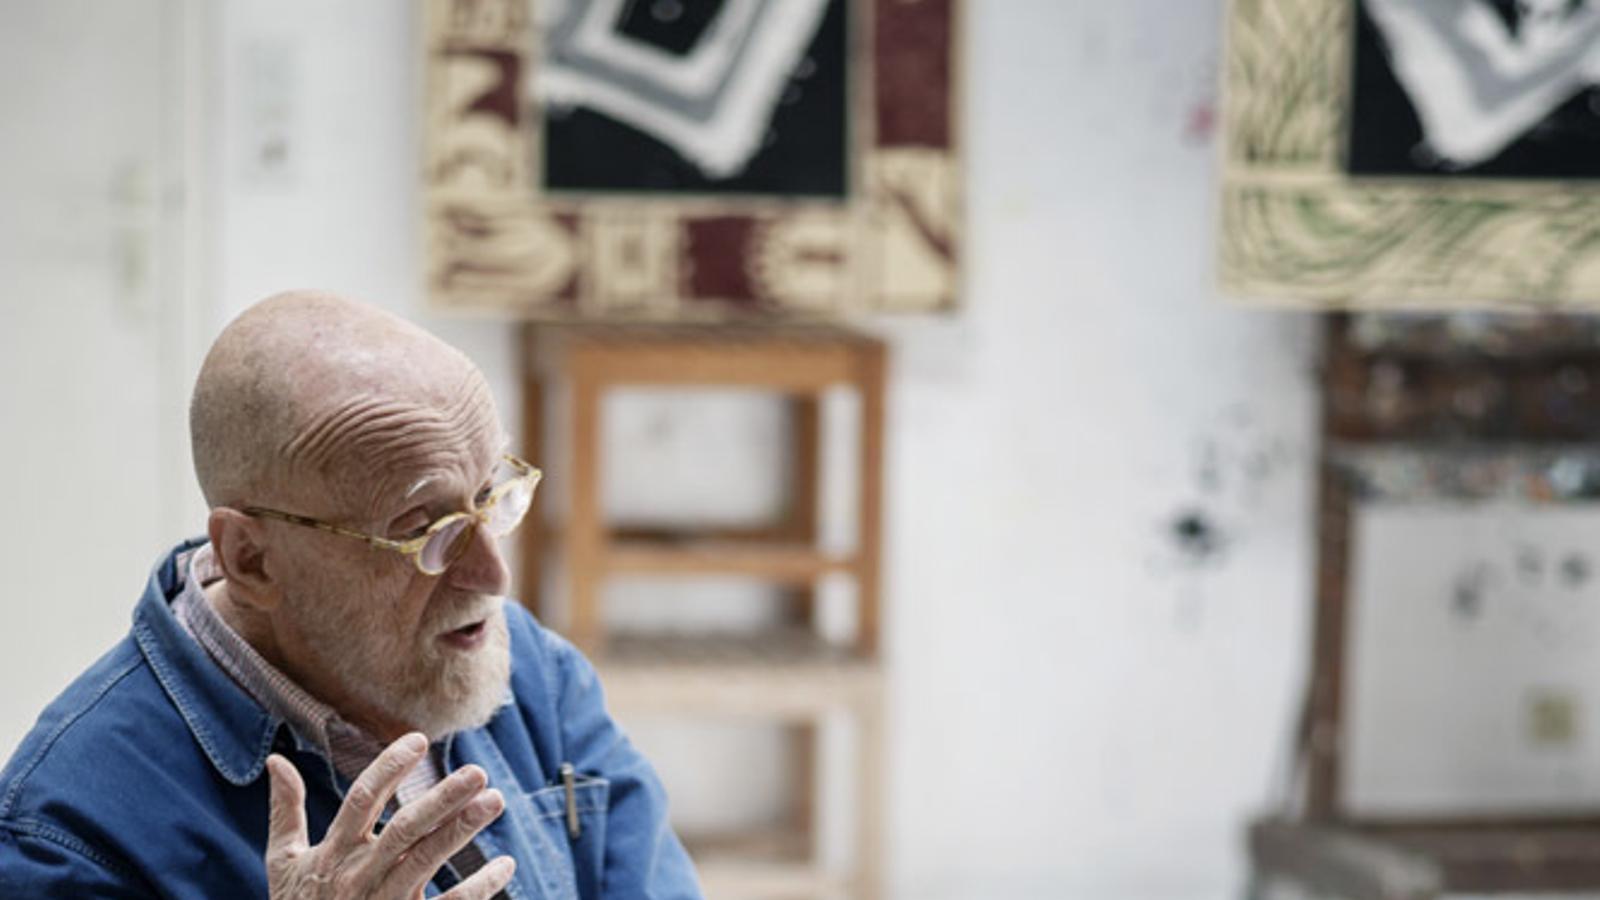 Pierre Alechinsky, visceral i venerable